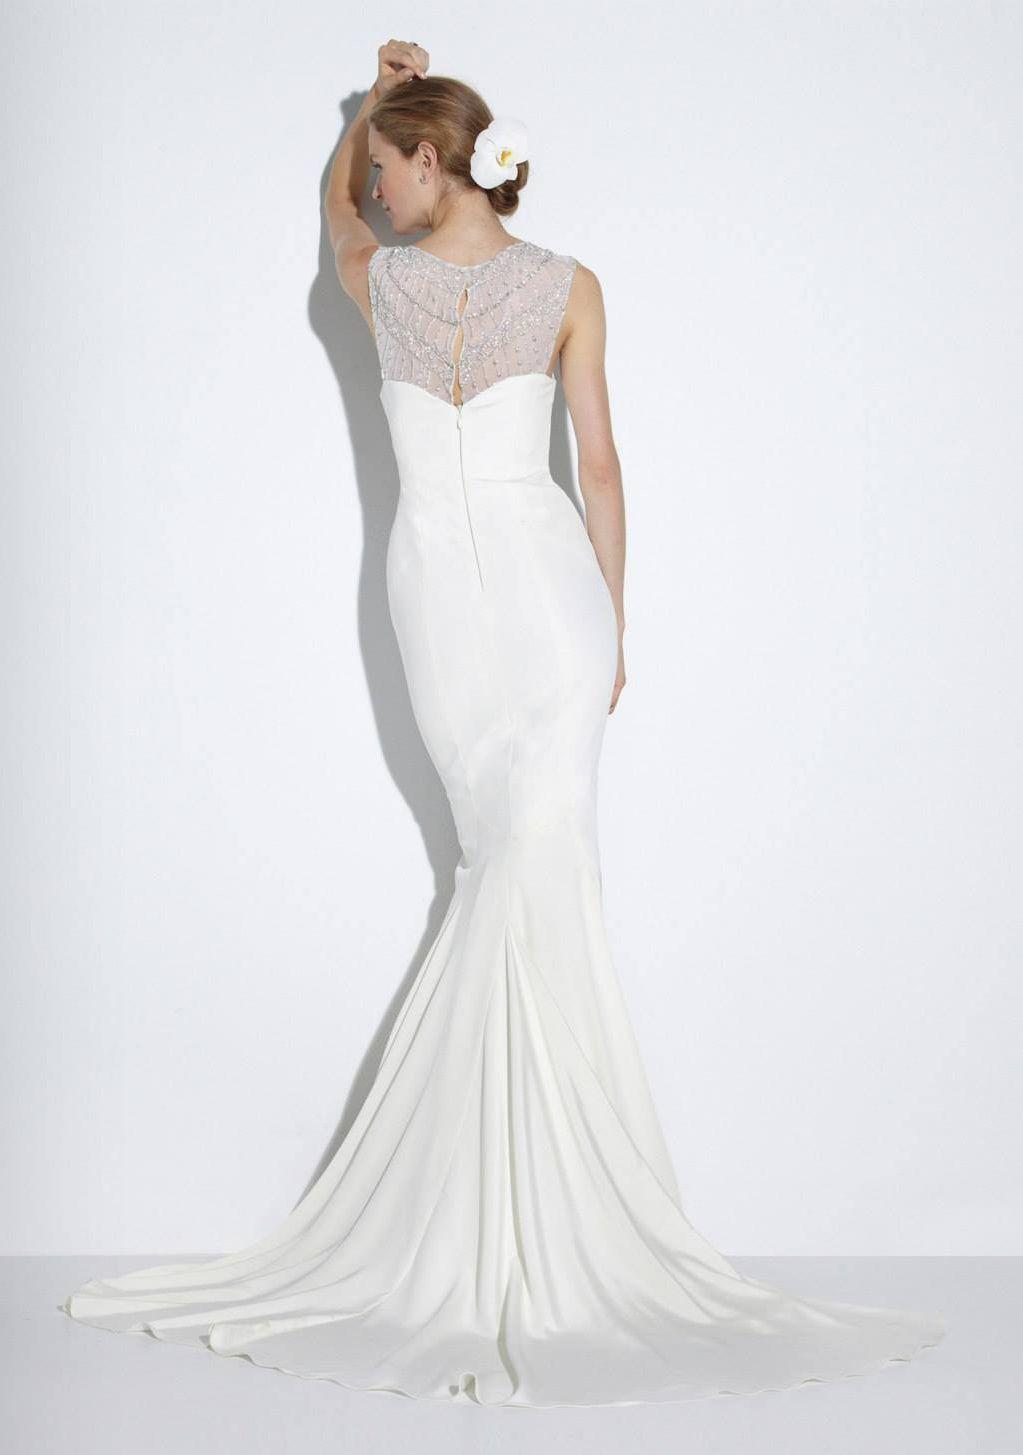 Nicole Miller Bridal Fall 2014 Caperesortswedding